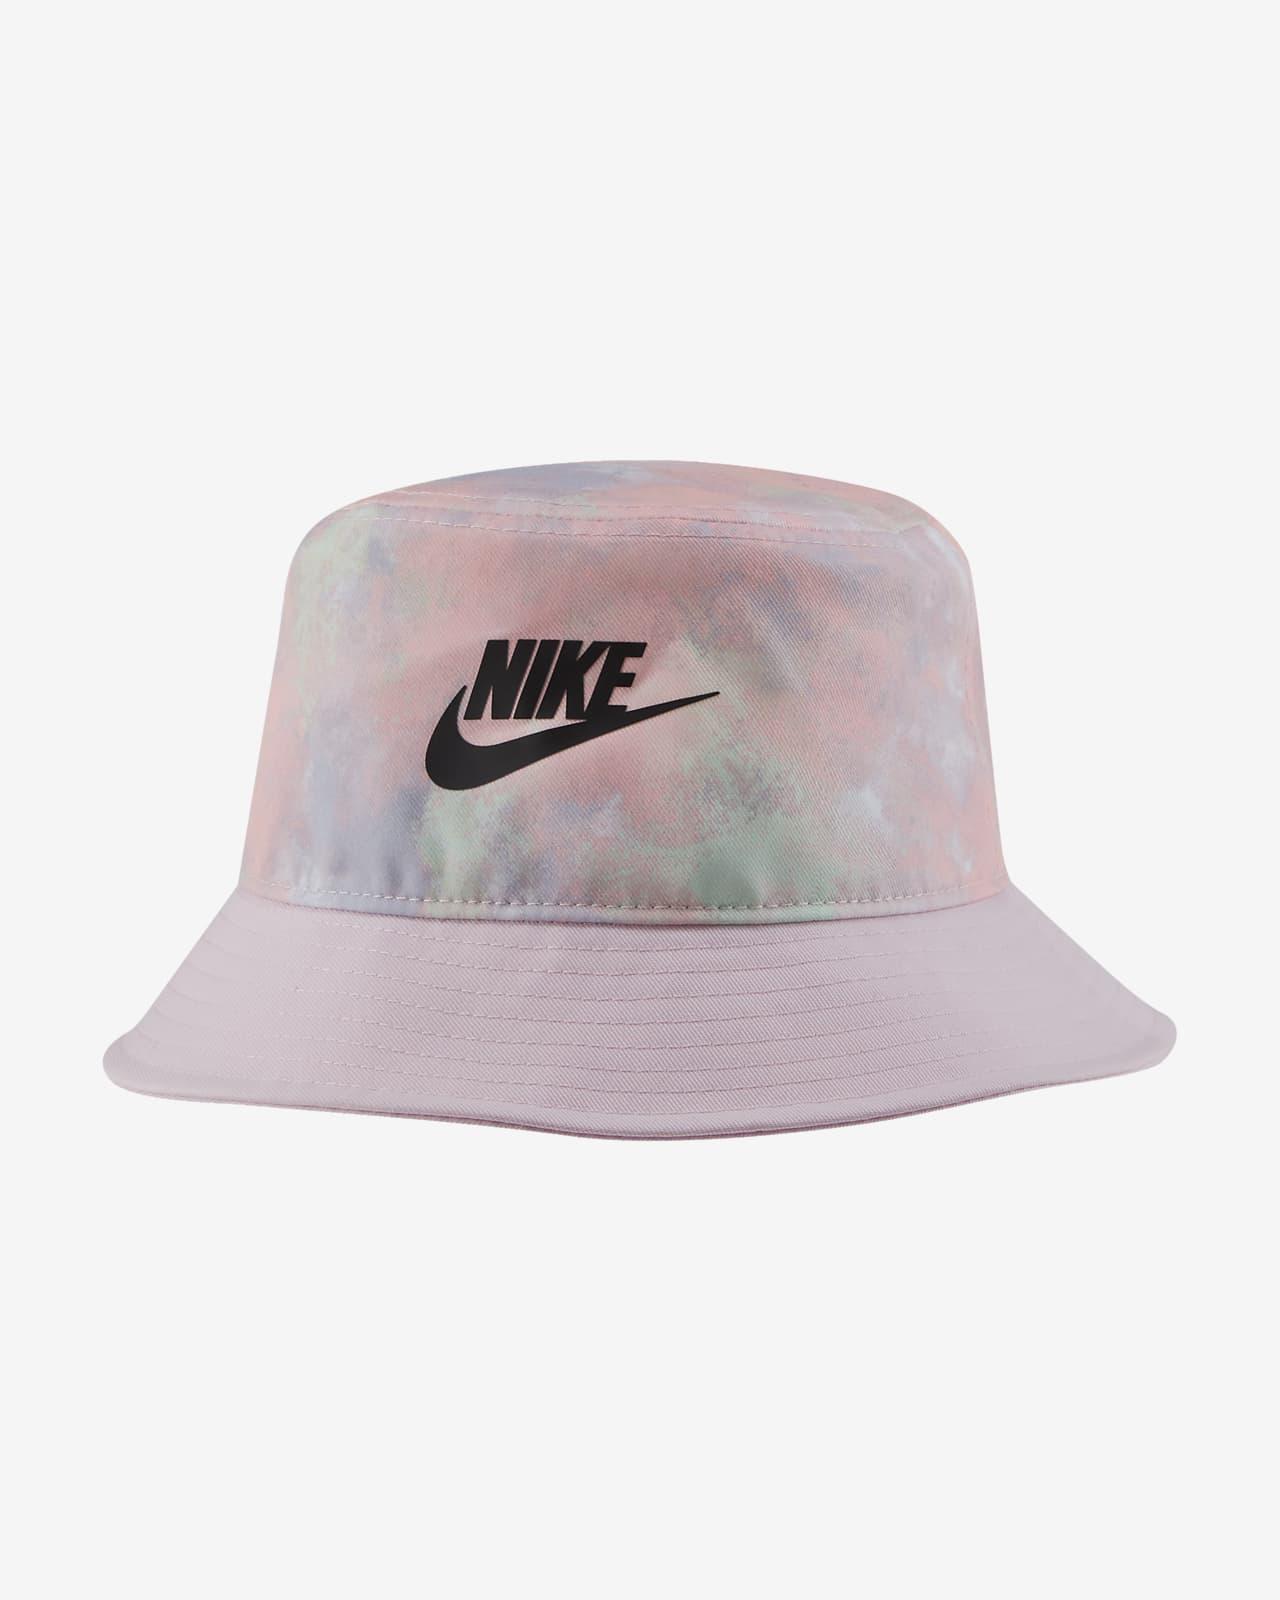 Cappello tie-dye Nike - Ragazzi